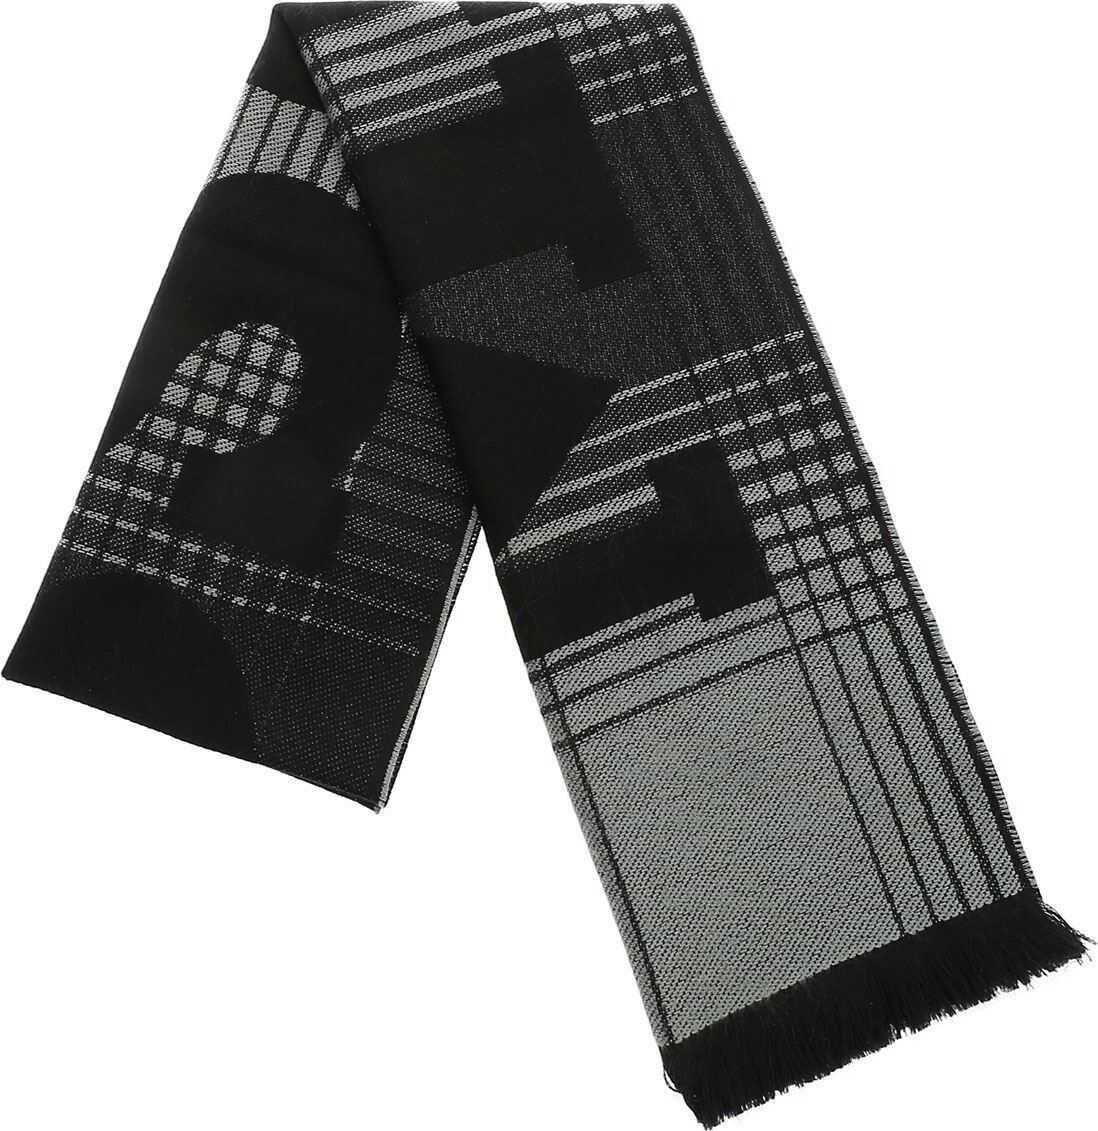 Missoni Scarf With Black And Grey Geometric Pattern Black